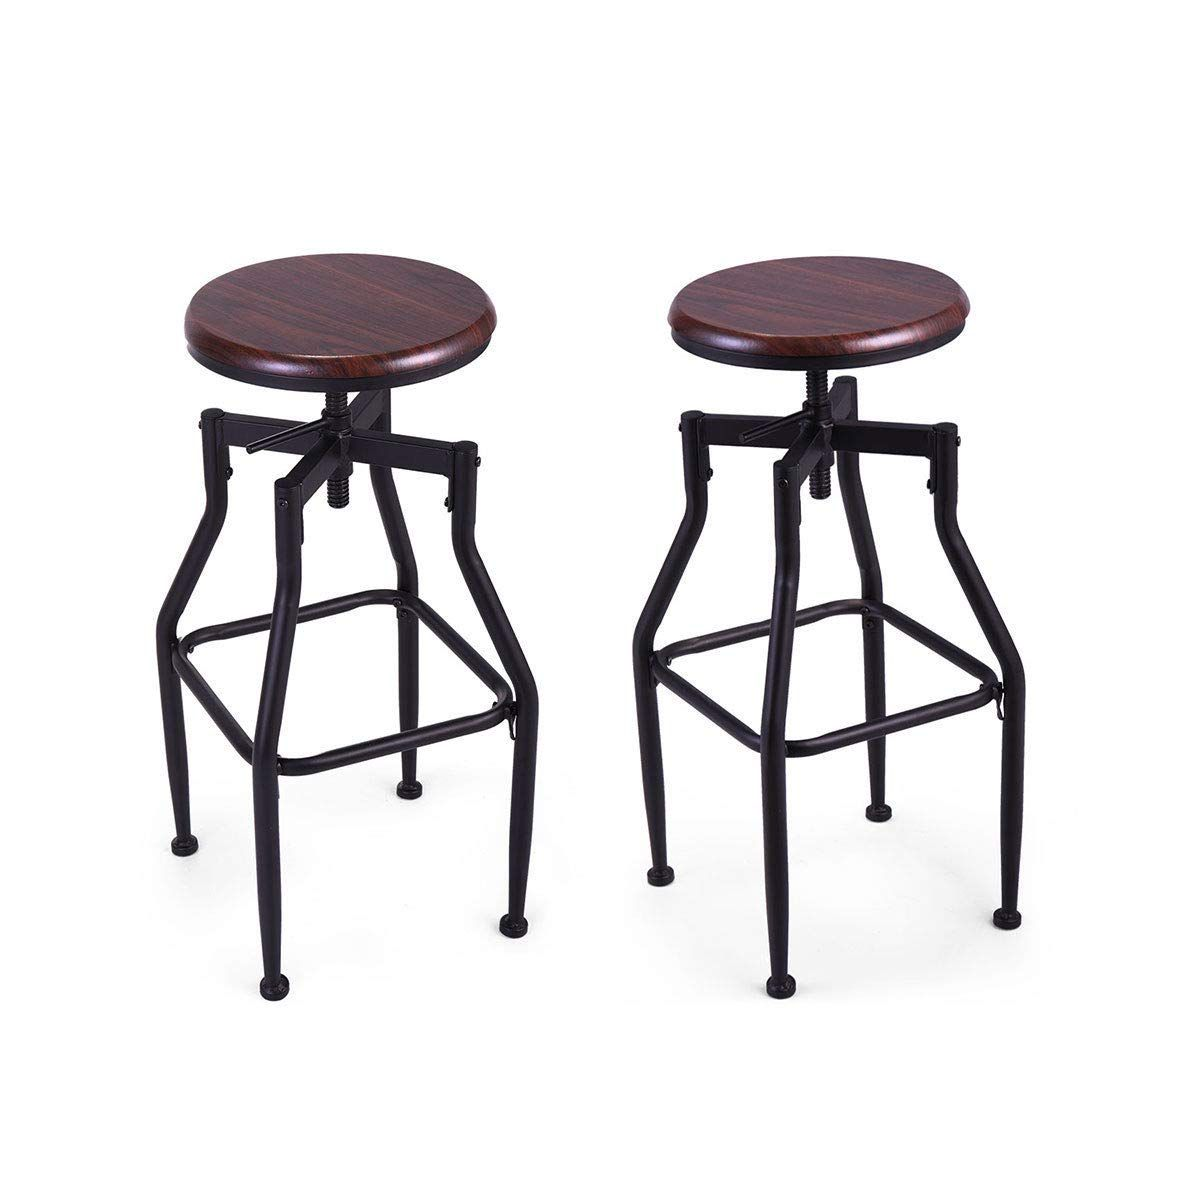 Ayamastro 44 2 H 3pcs Adjustable Swivel Bar Stool High Counter Seat W Footrest Backrest With Ebook Adjustable Bar Stools Bar Stools Swivel Bar Stools